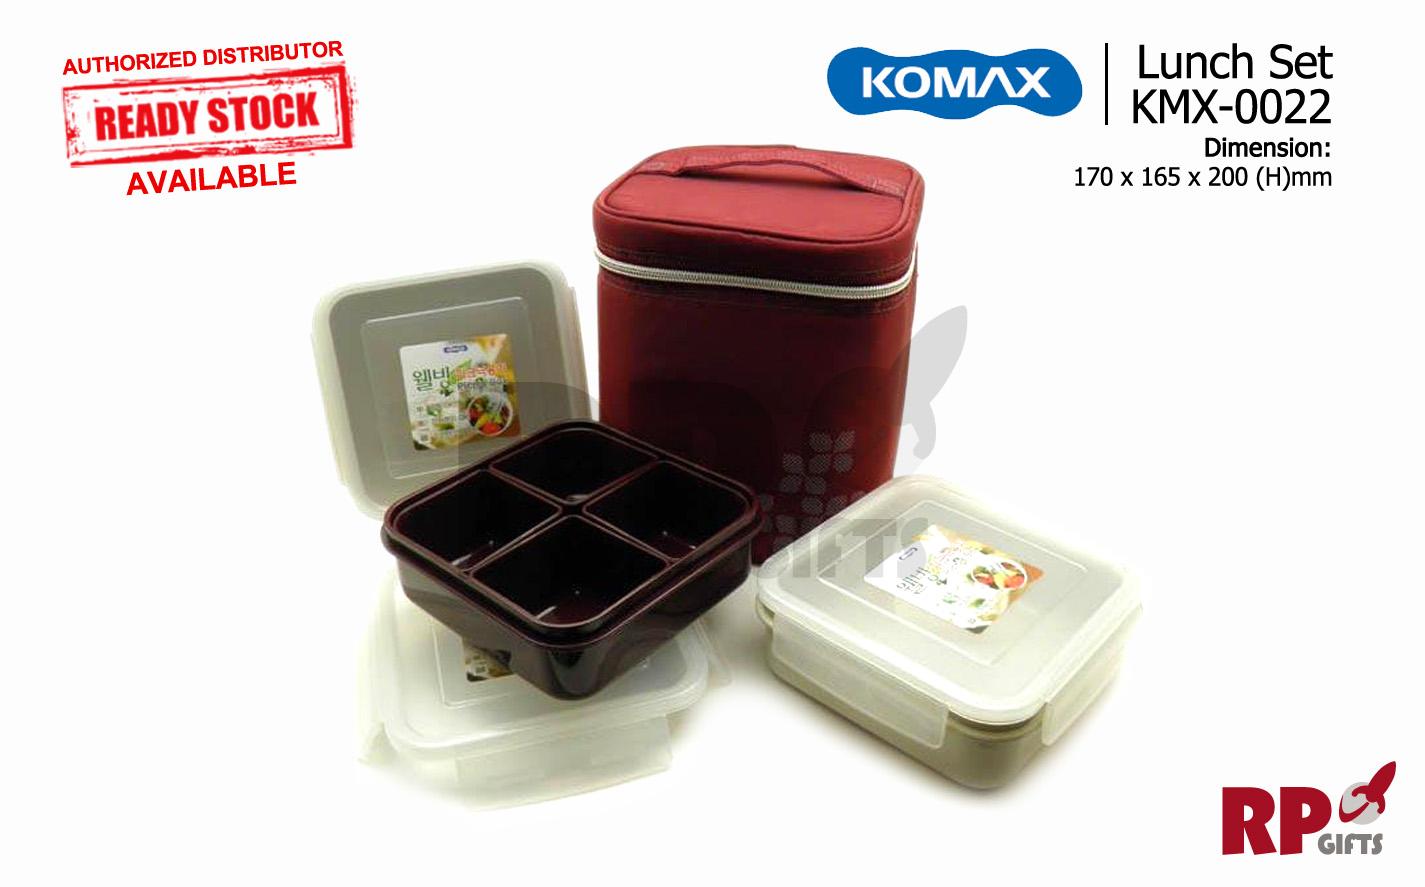 Brand - Komax